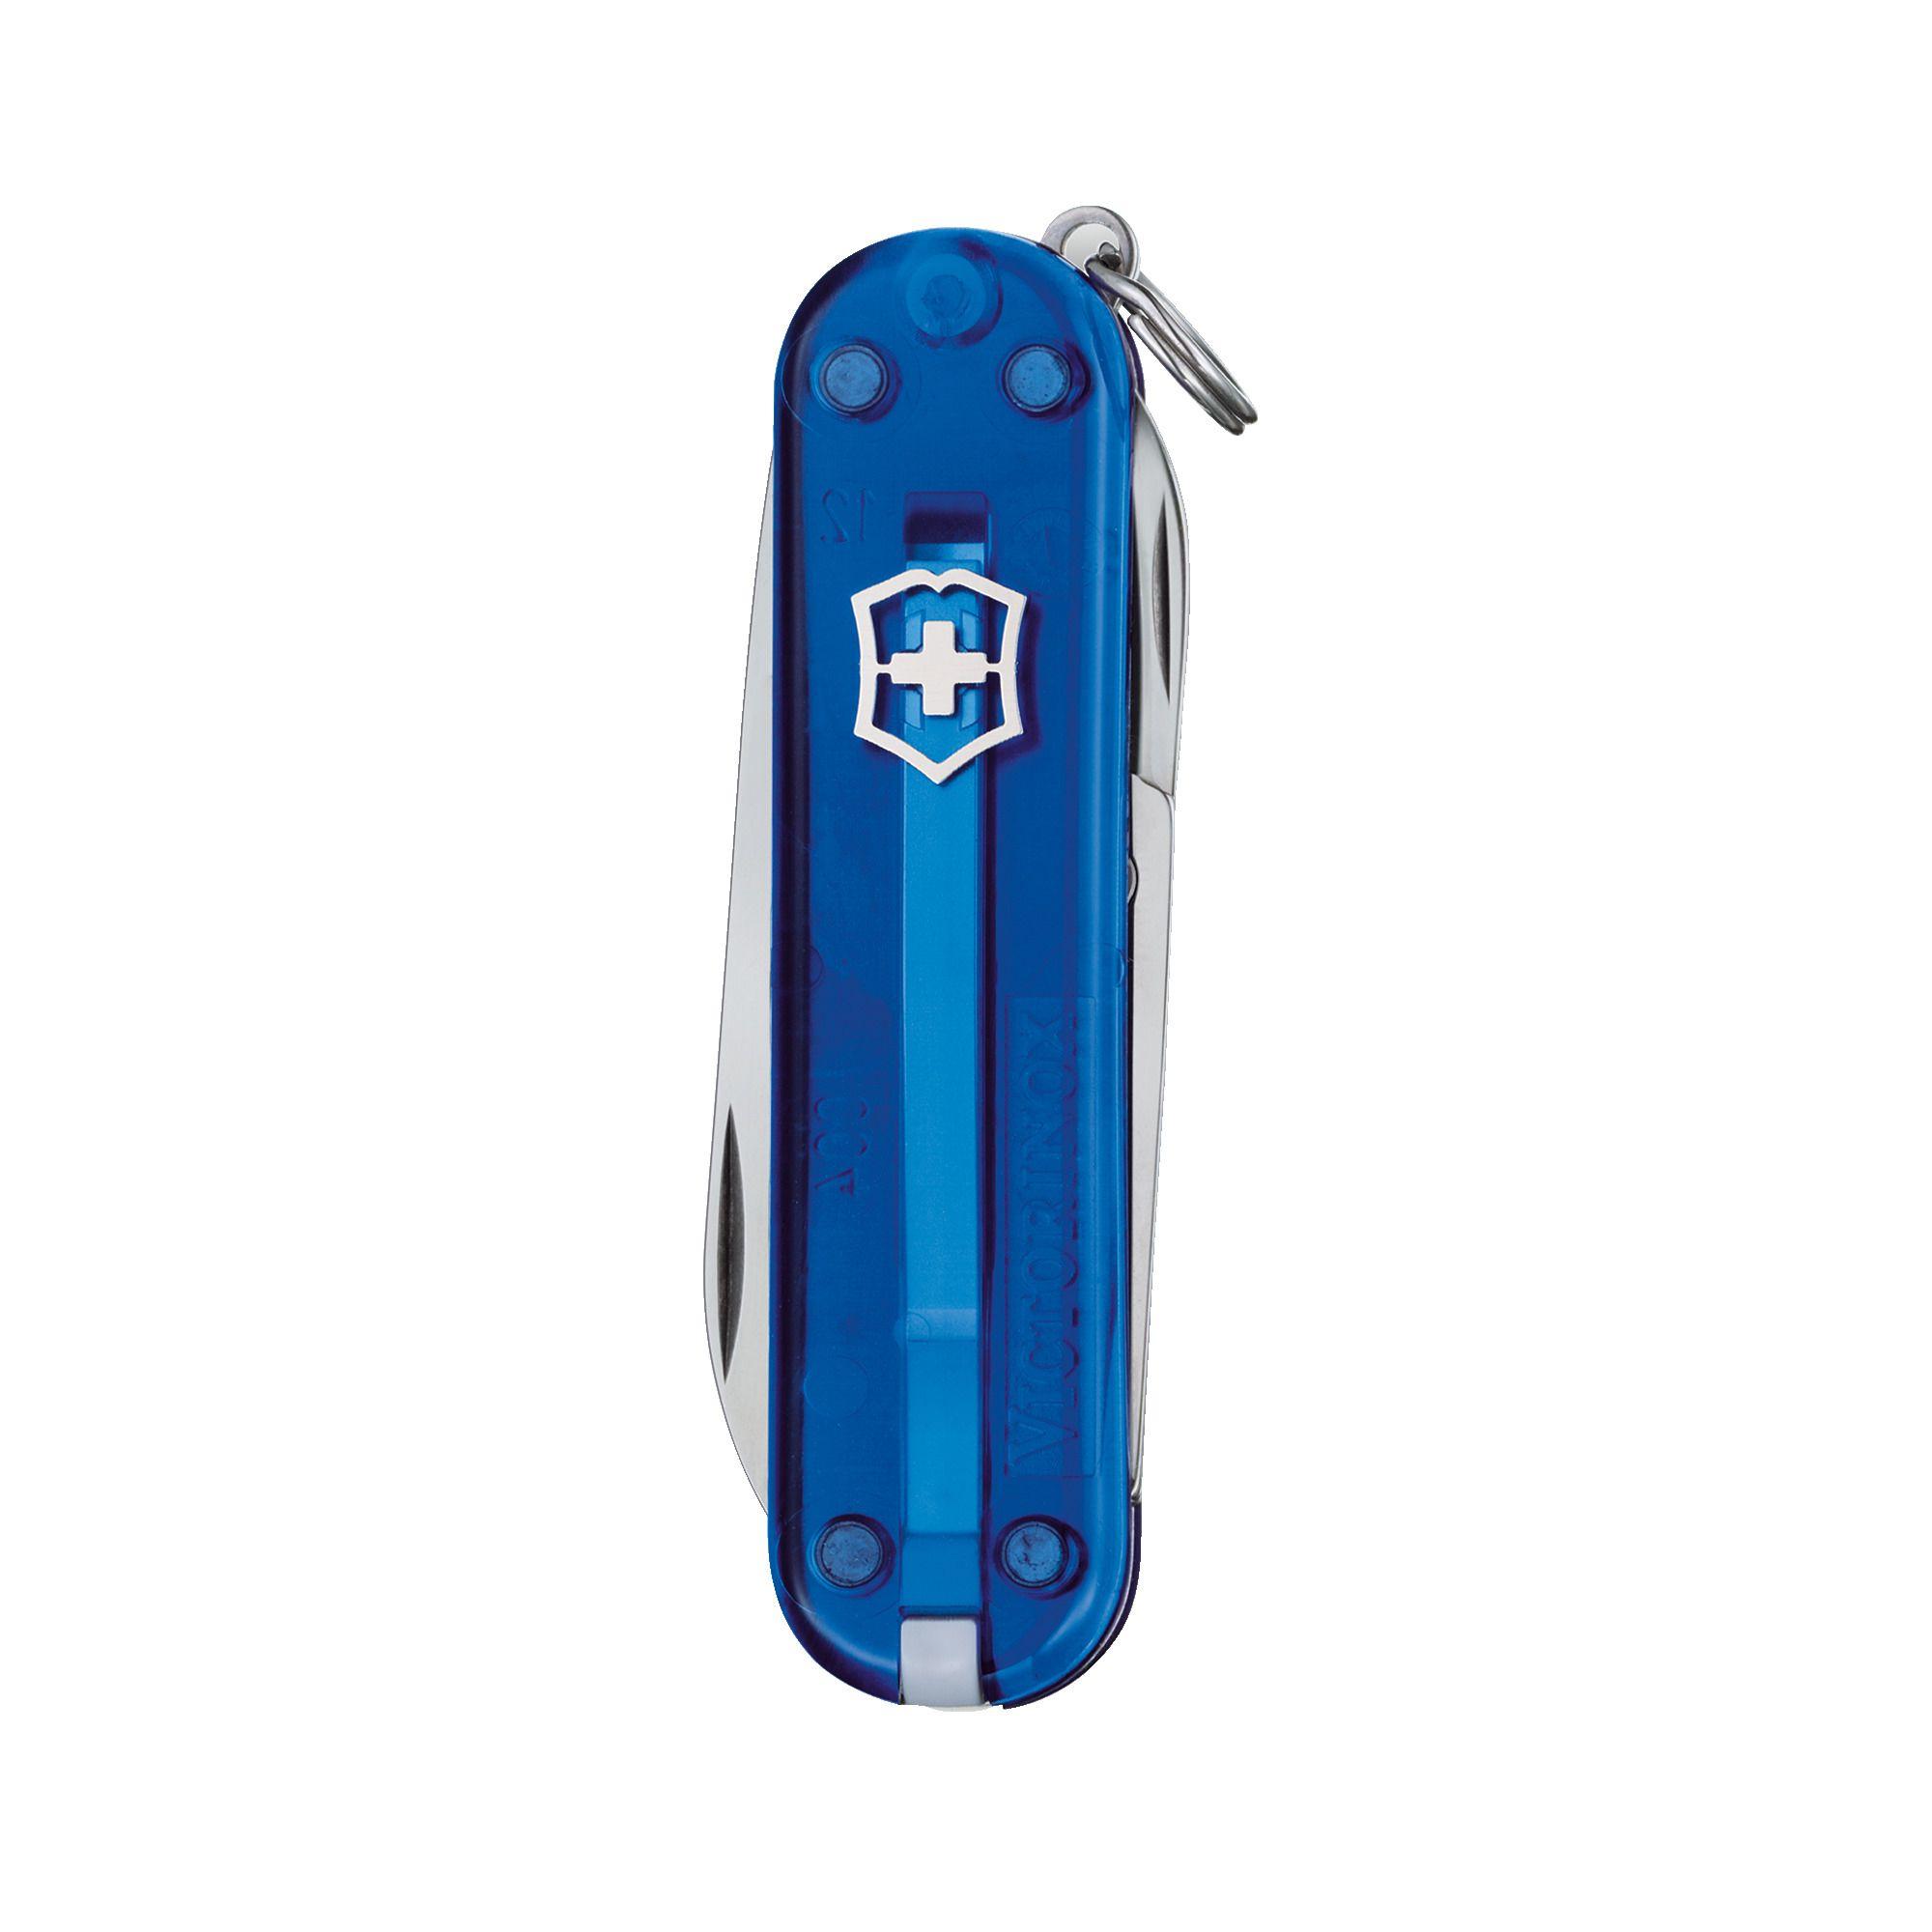 Canivete Classic SD 7 Funções Azul Transparente - Victorinox